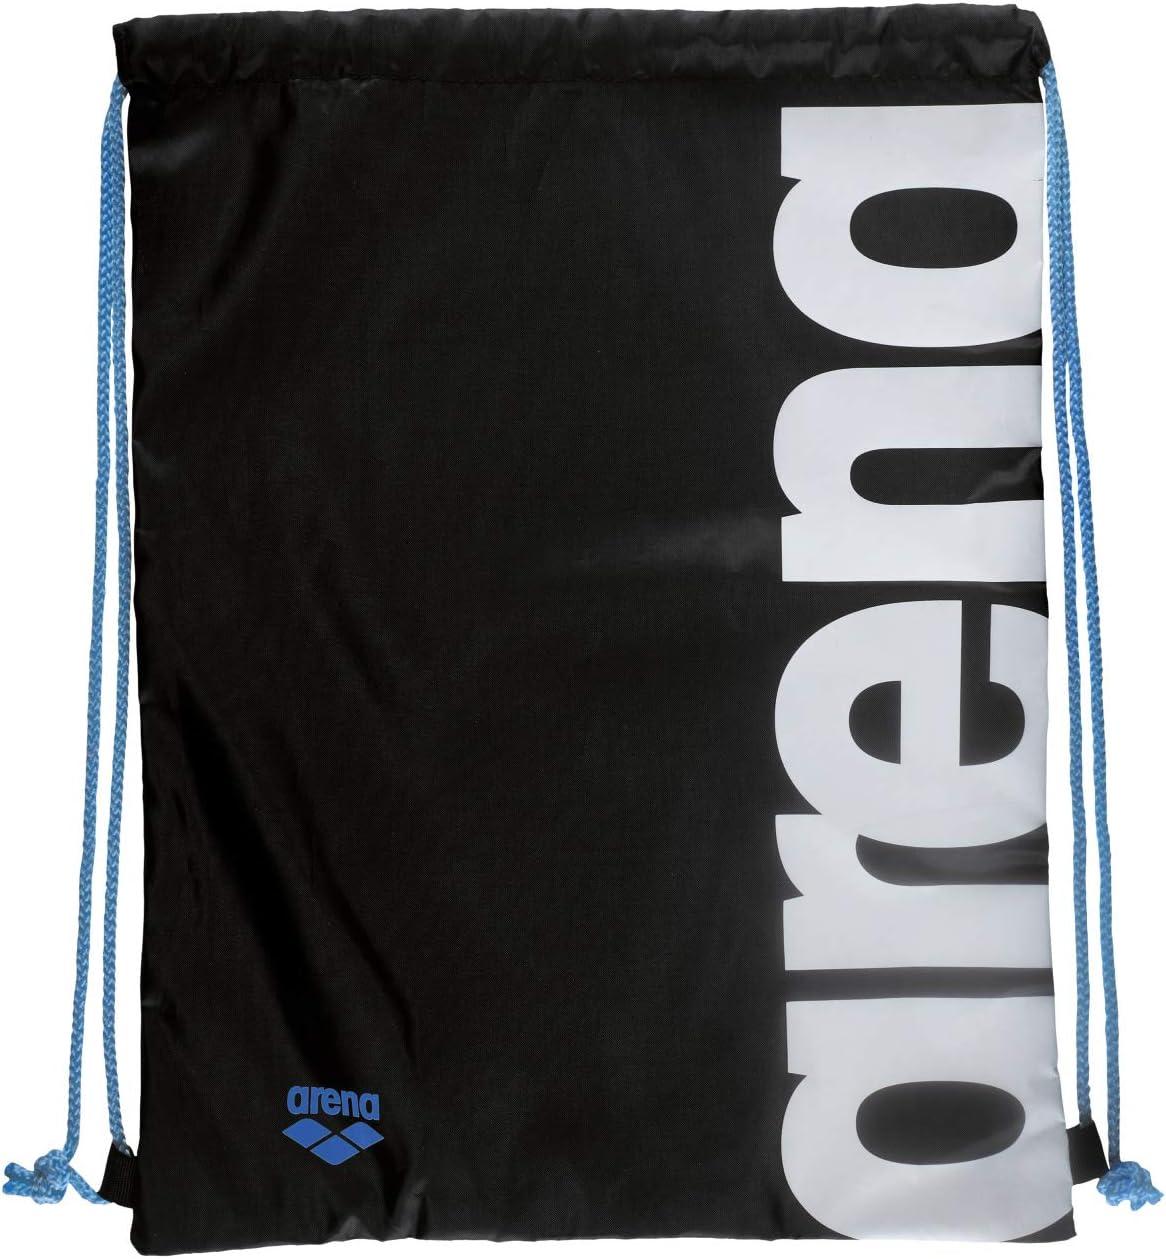 ARENA 36 x 46 cm Sacchetto sportivo 93605 con coulisse Unisex Adulto 1,3 l Sacca unisex 2 in 1 Fast Swimbag